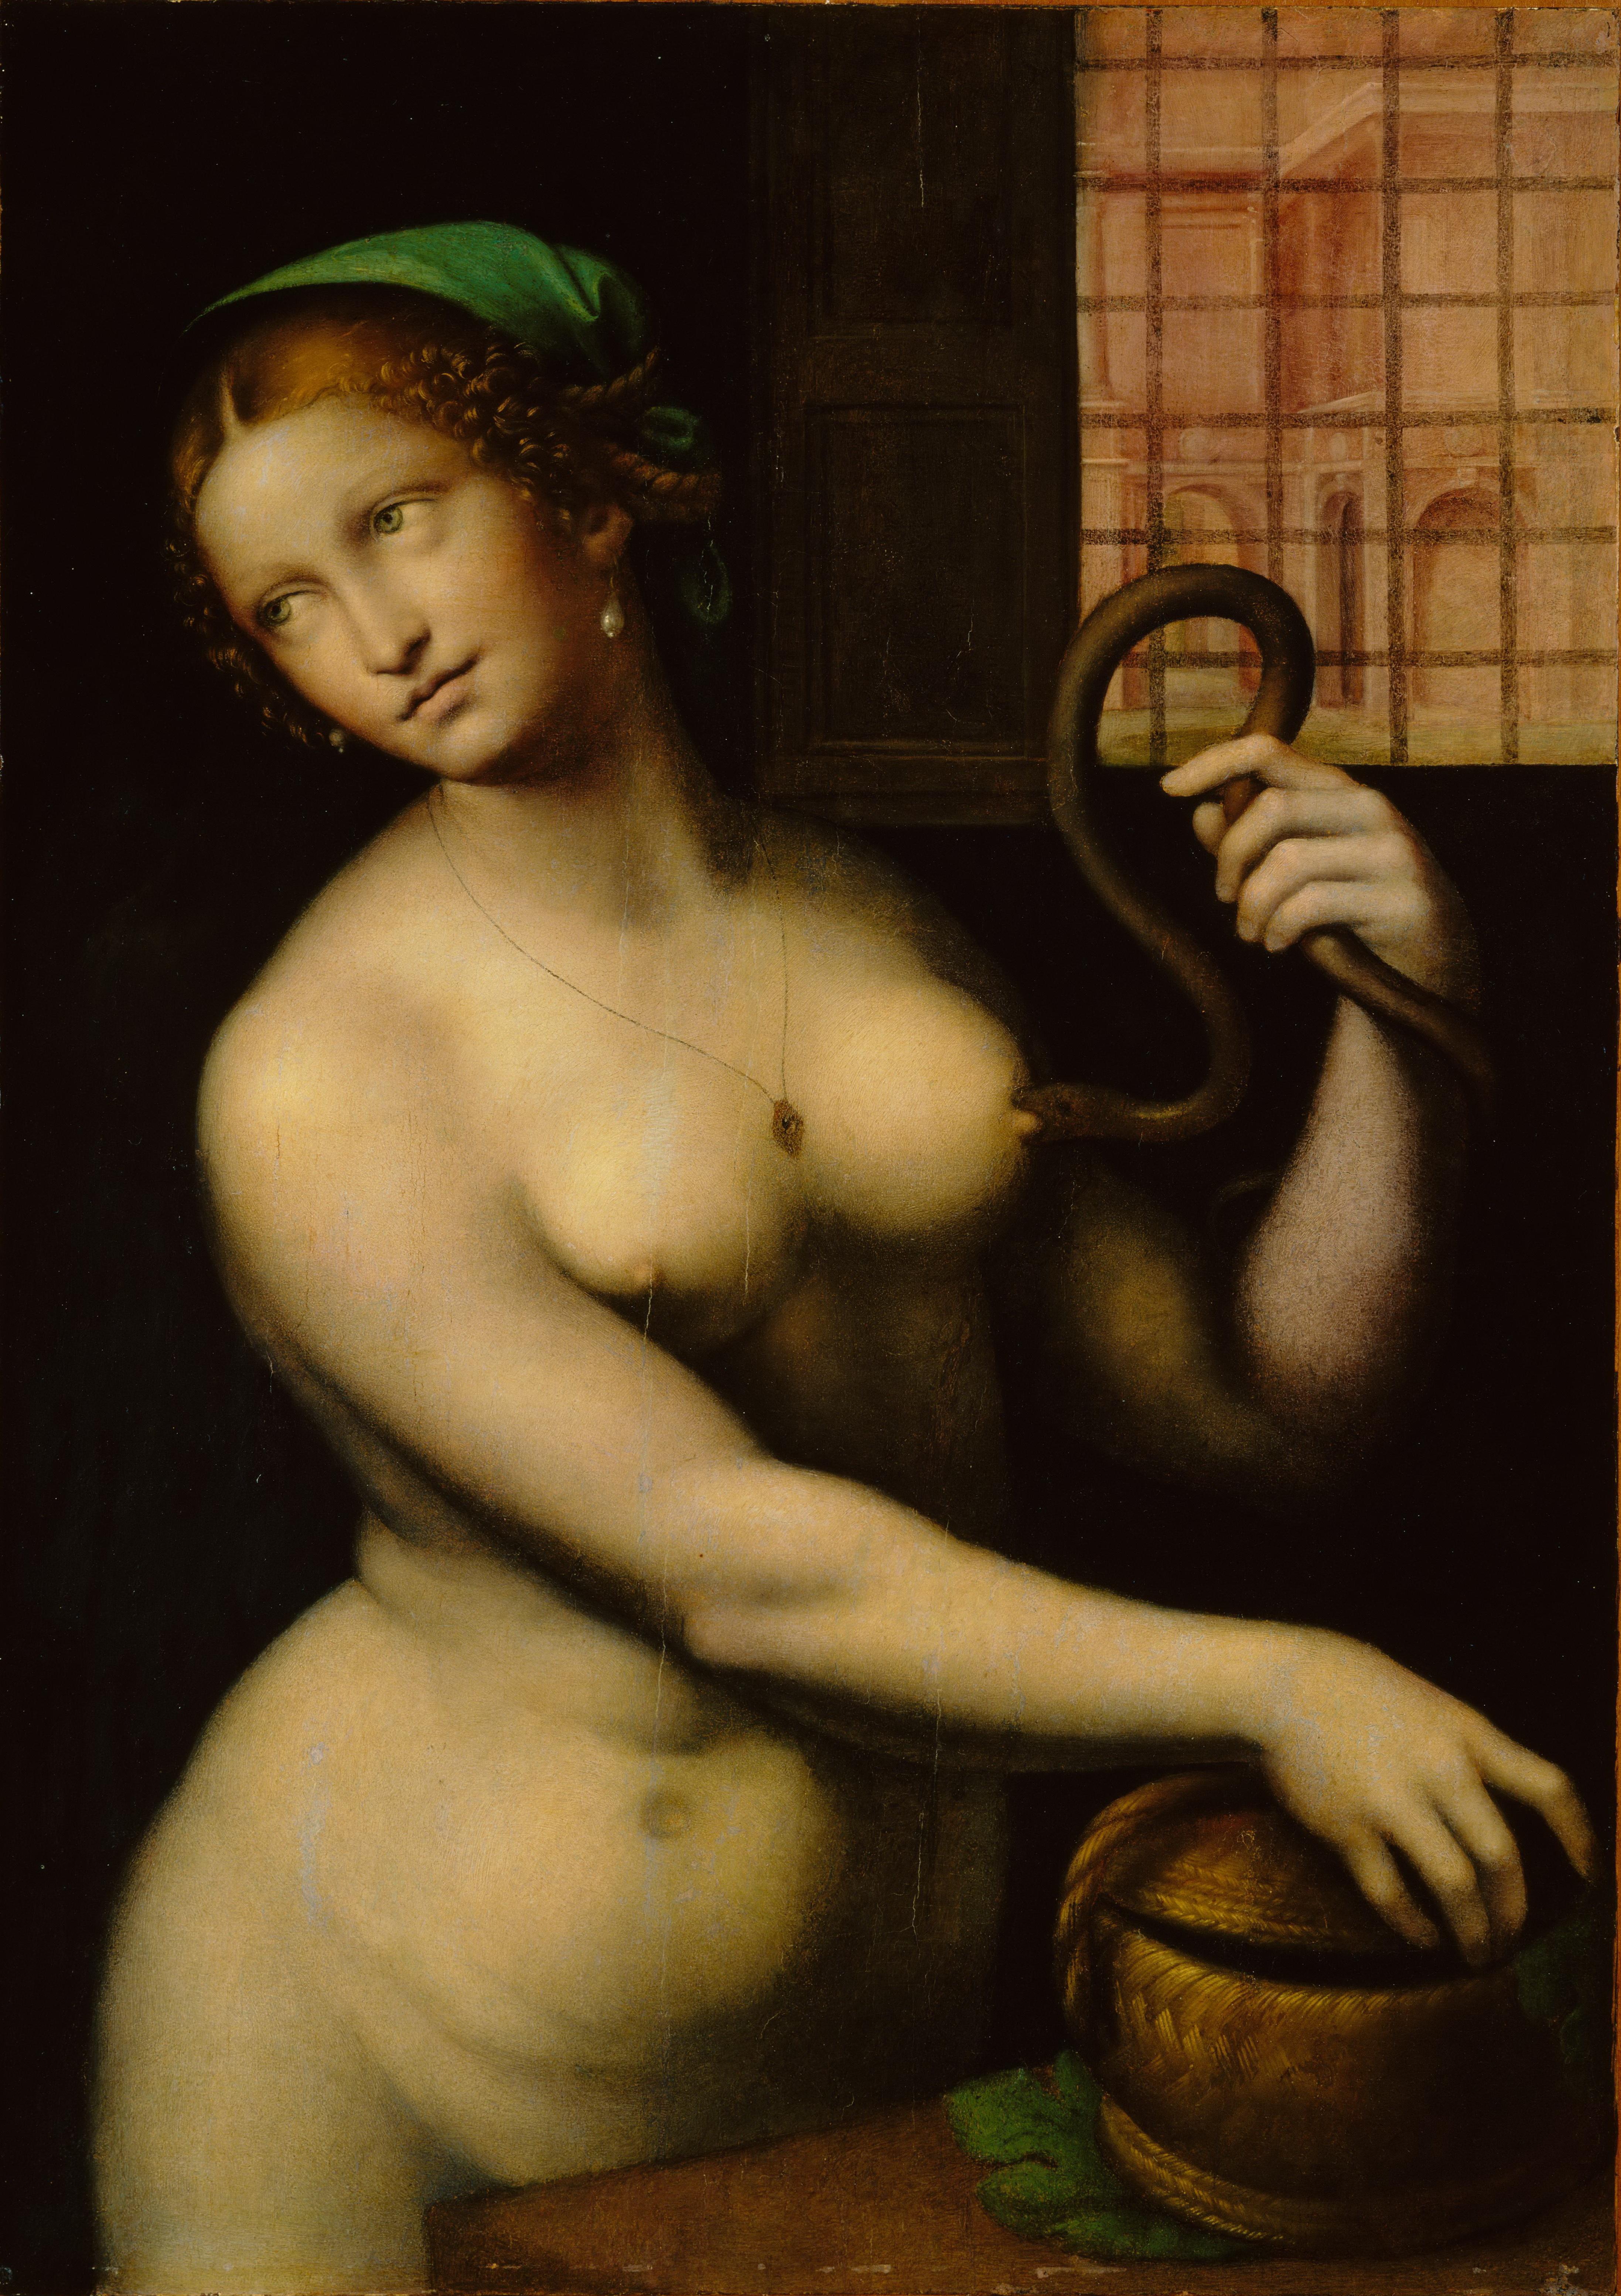 Giampetrino, 1495-1549. Клеопатра. 1520-1540. Оберлин, Музей искусства колледжа